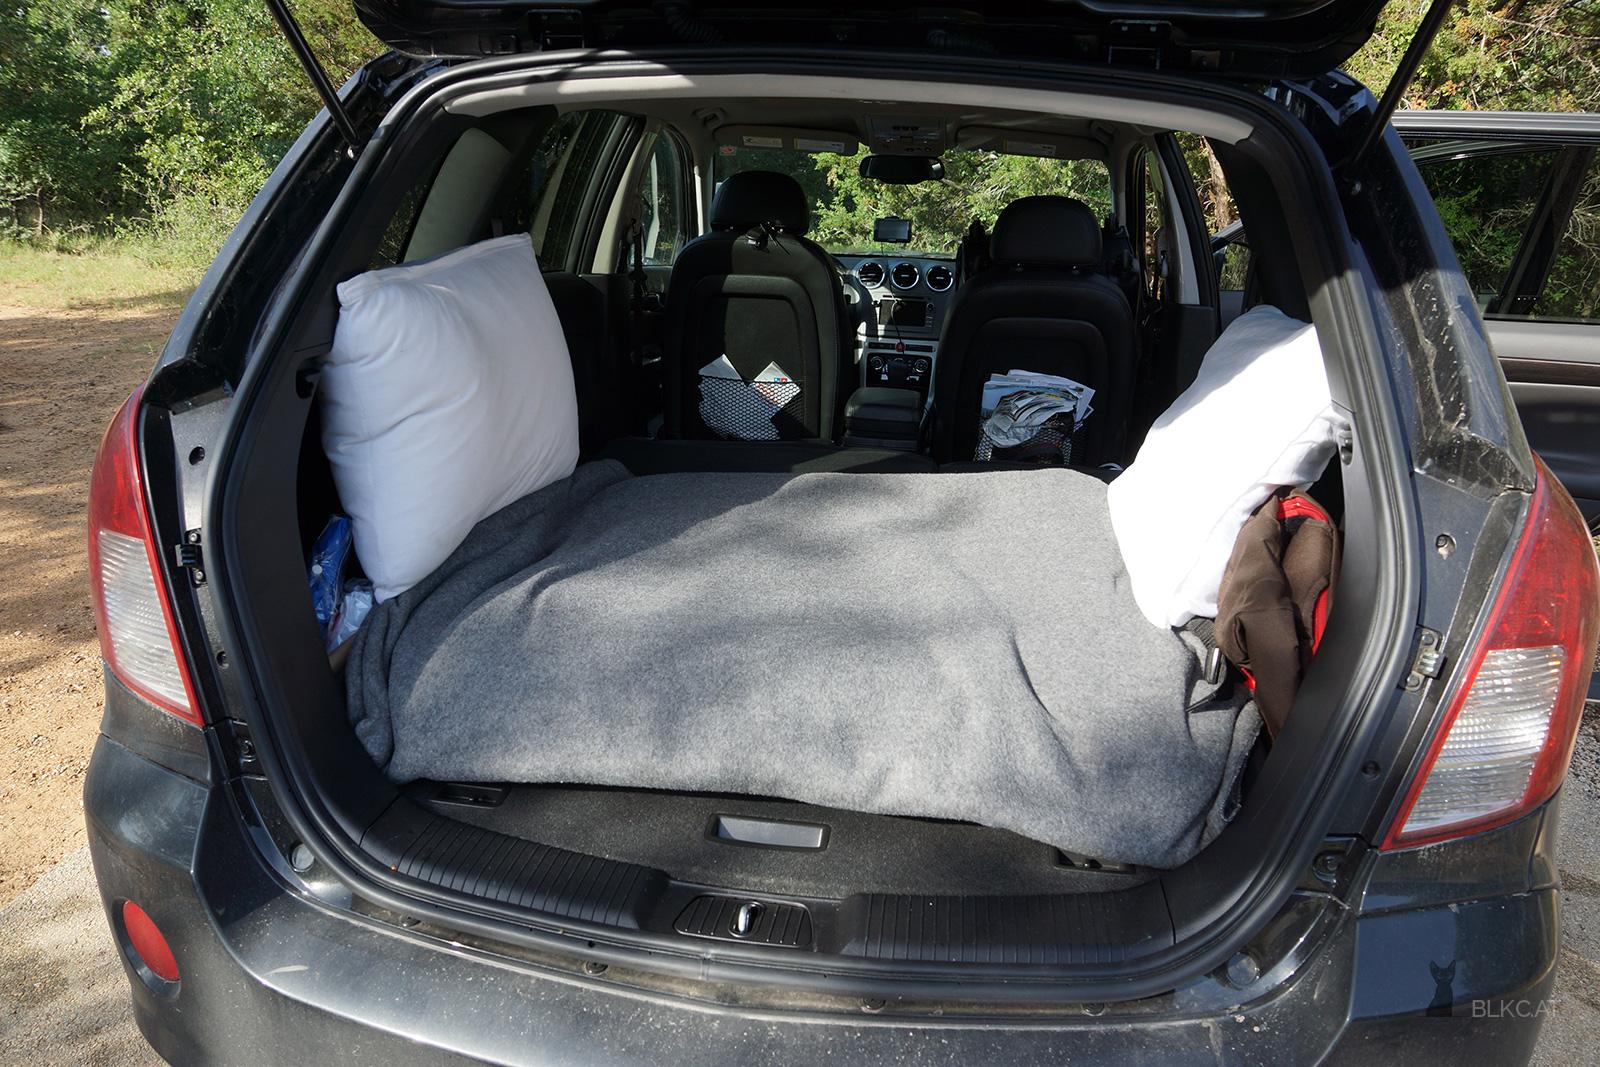 Gepäck-verstaut-Chevrolet-Captiva